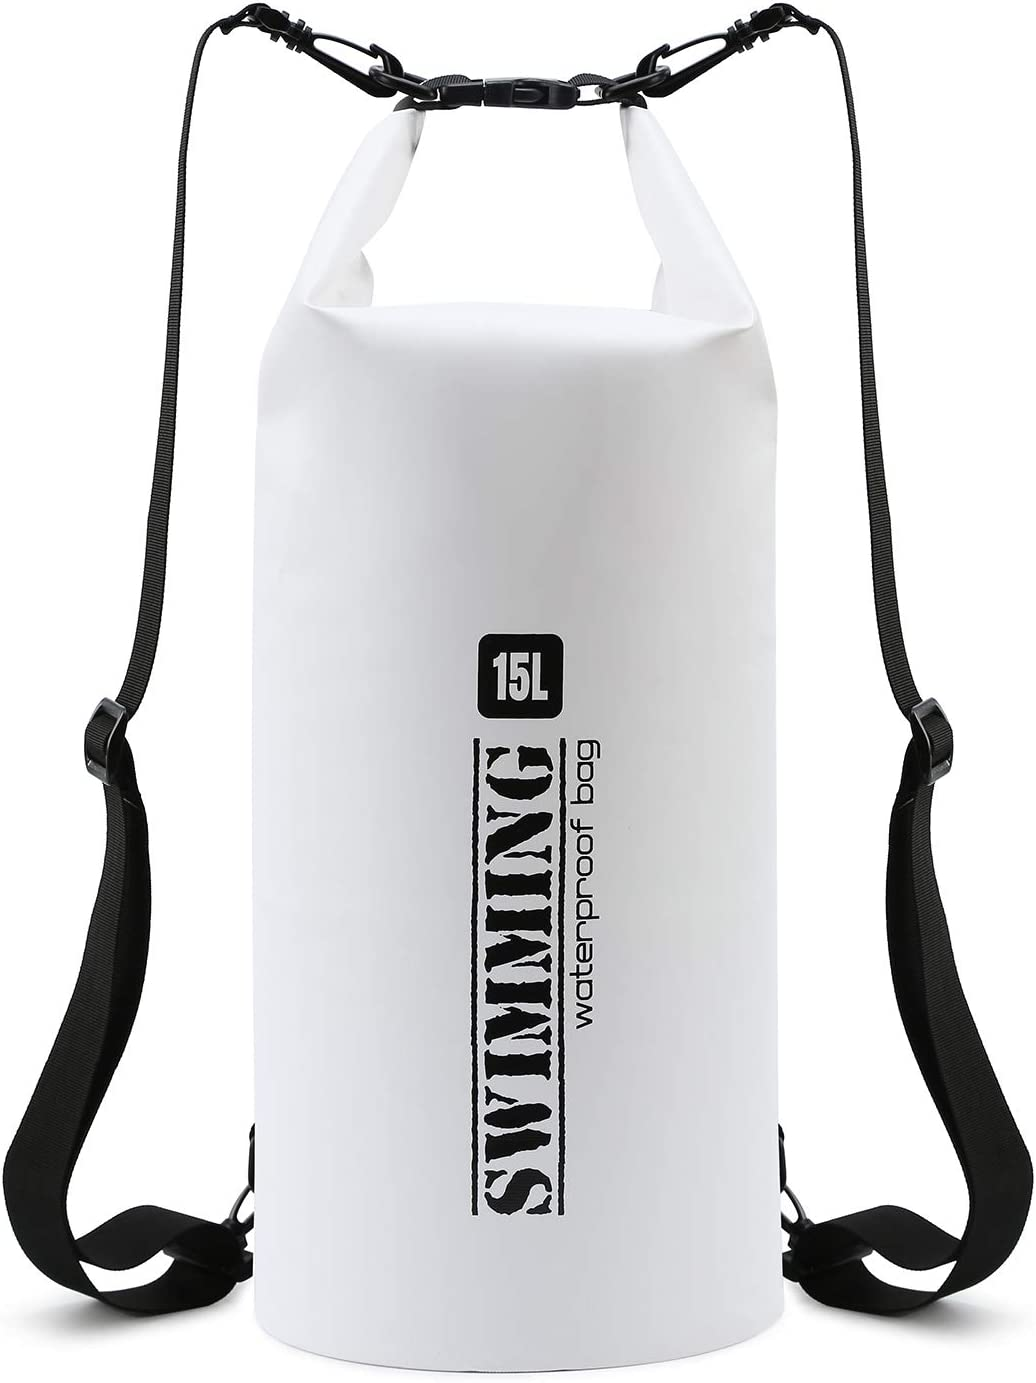 Floating Waterproof Dry Bag,PVC Waterproof Bag Roll Top Lightweight 15L for Kayaking, Rafting, Boating, Surfing,Beach,Swimming,Fishing